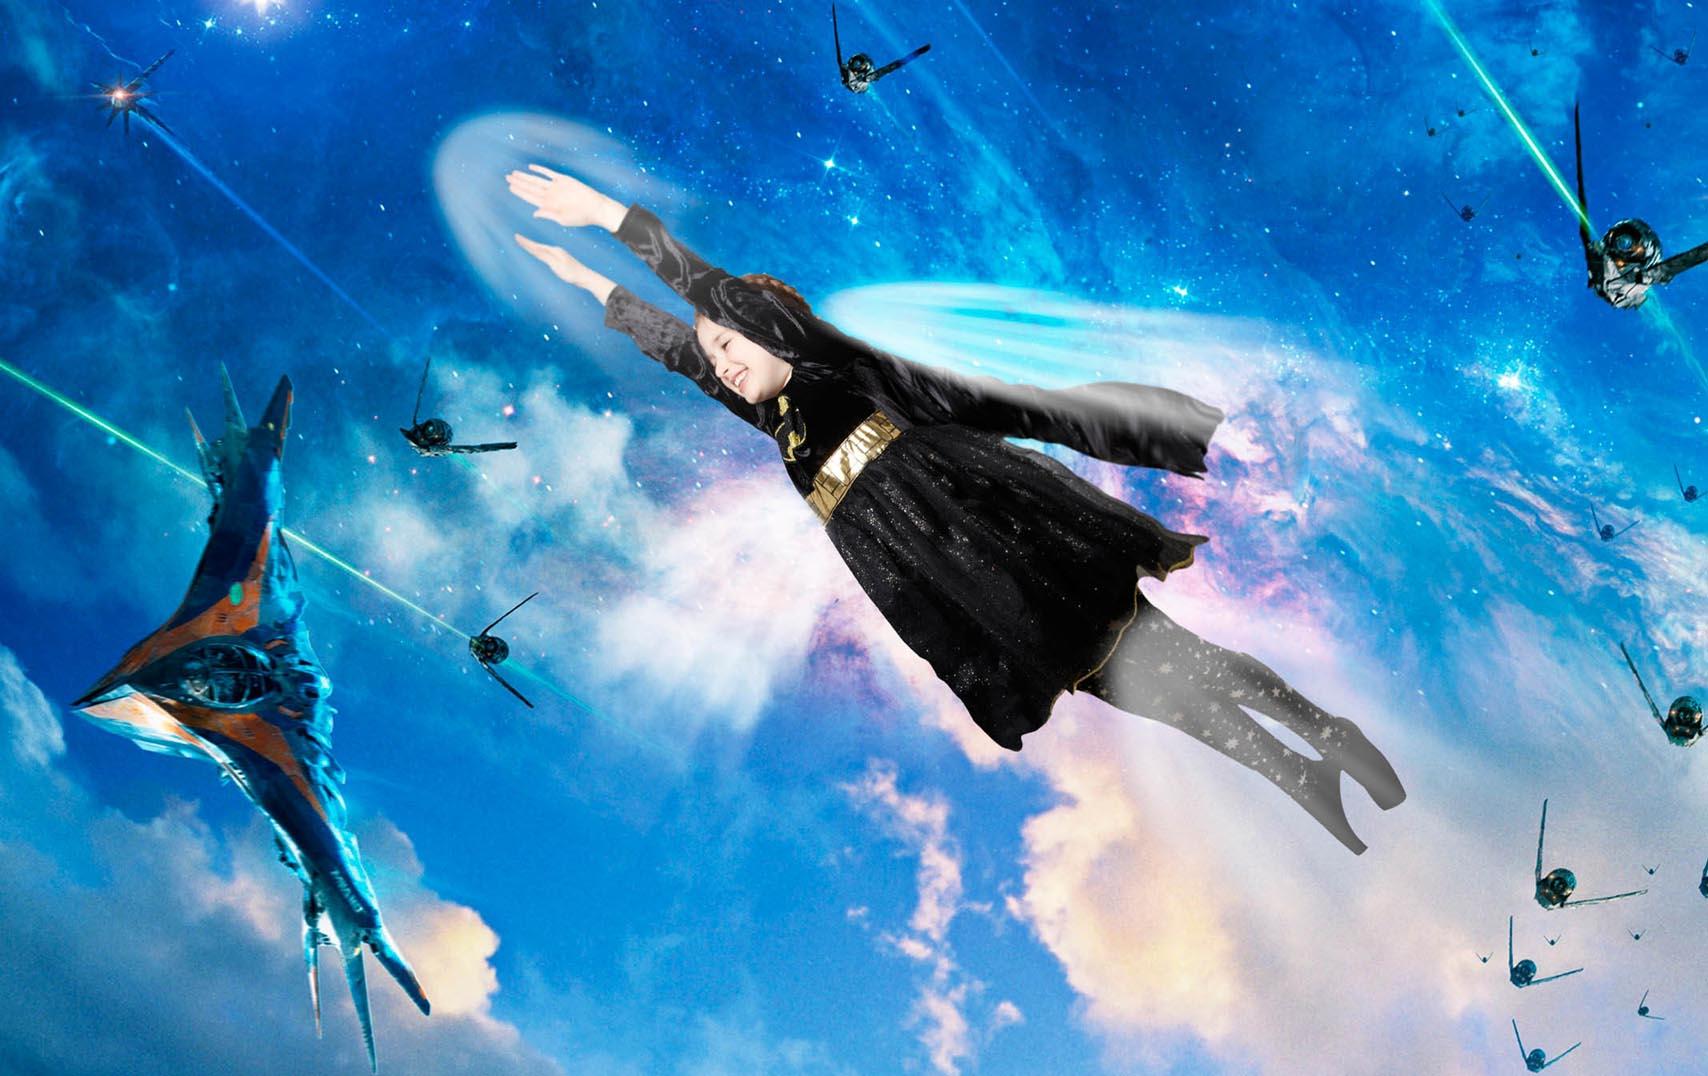 Mattea flying.jpg